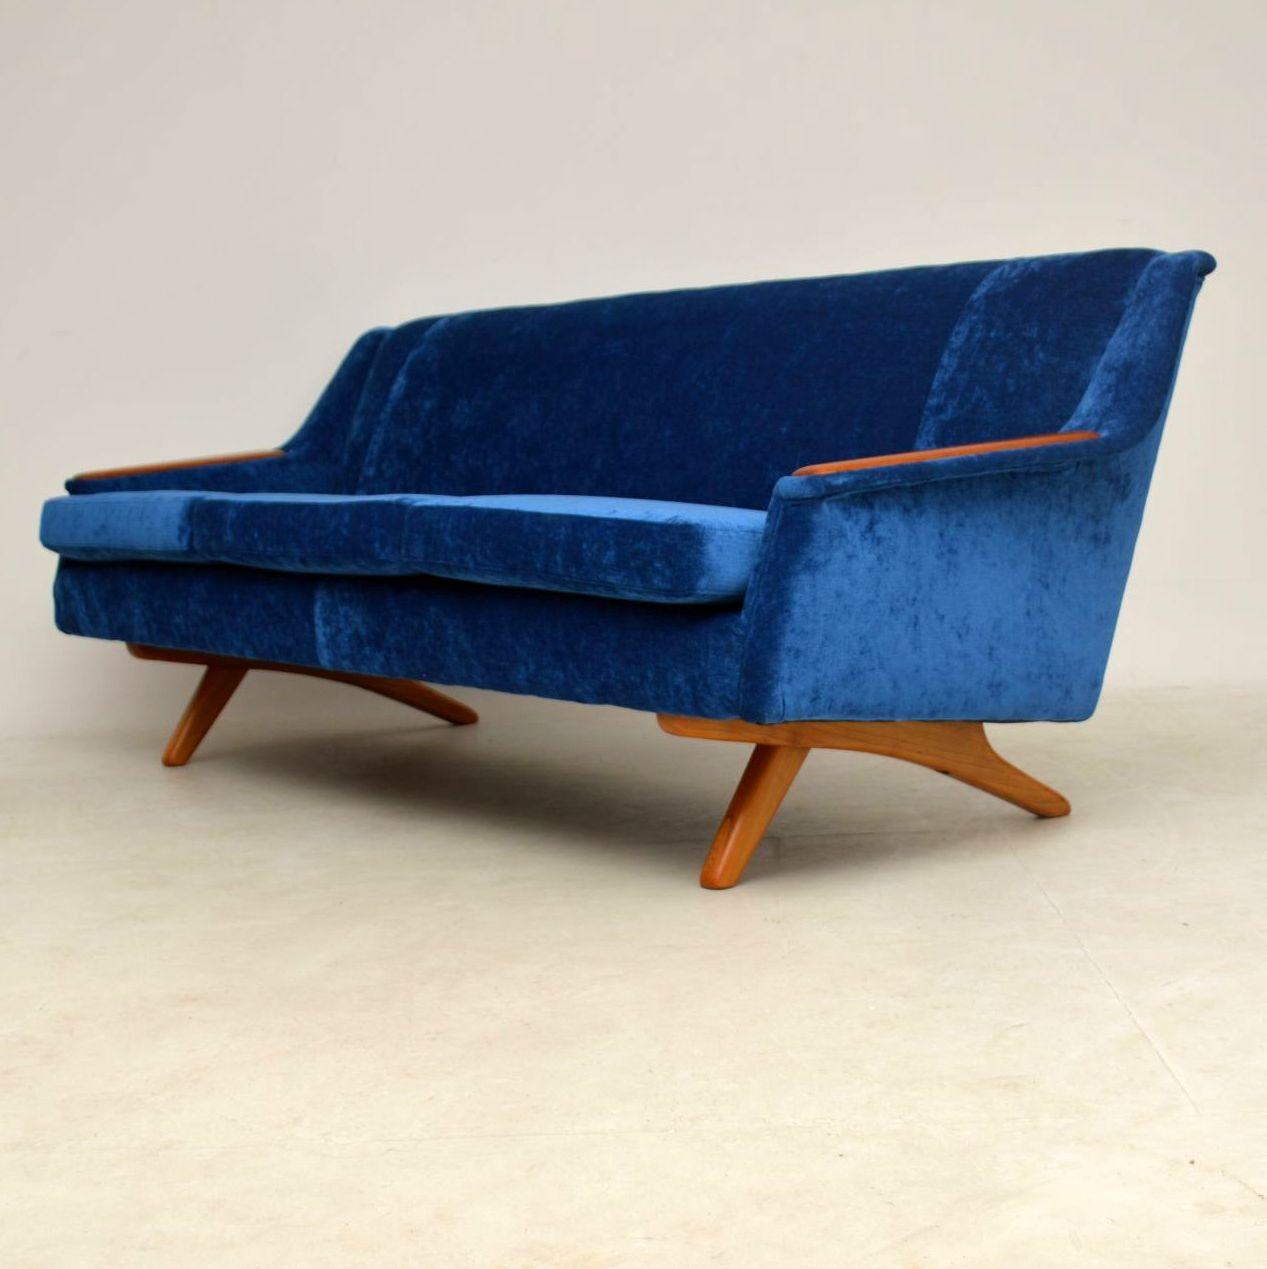 ... 1960u0027s Vintage Sofa By Illum Wikkelso For Westnofa ...